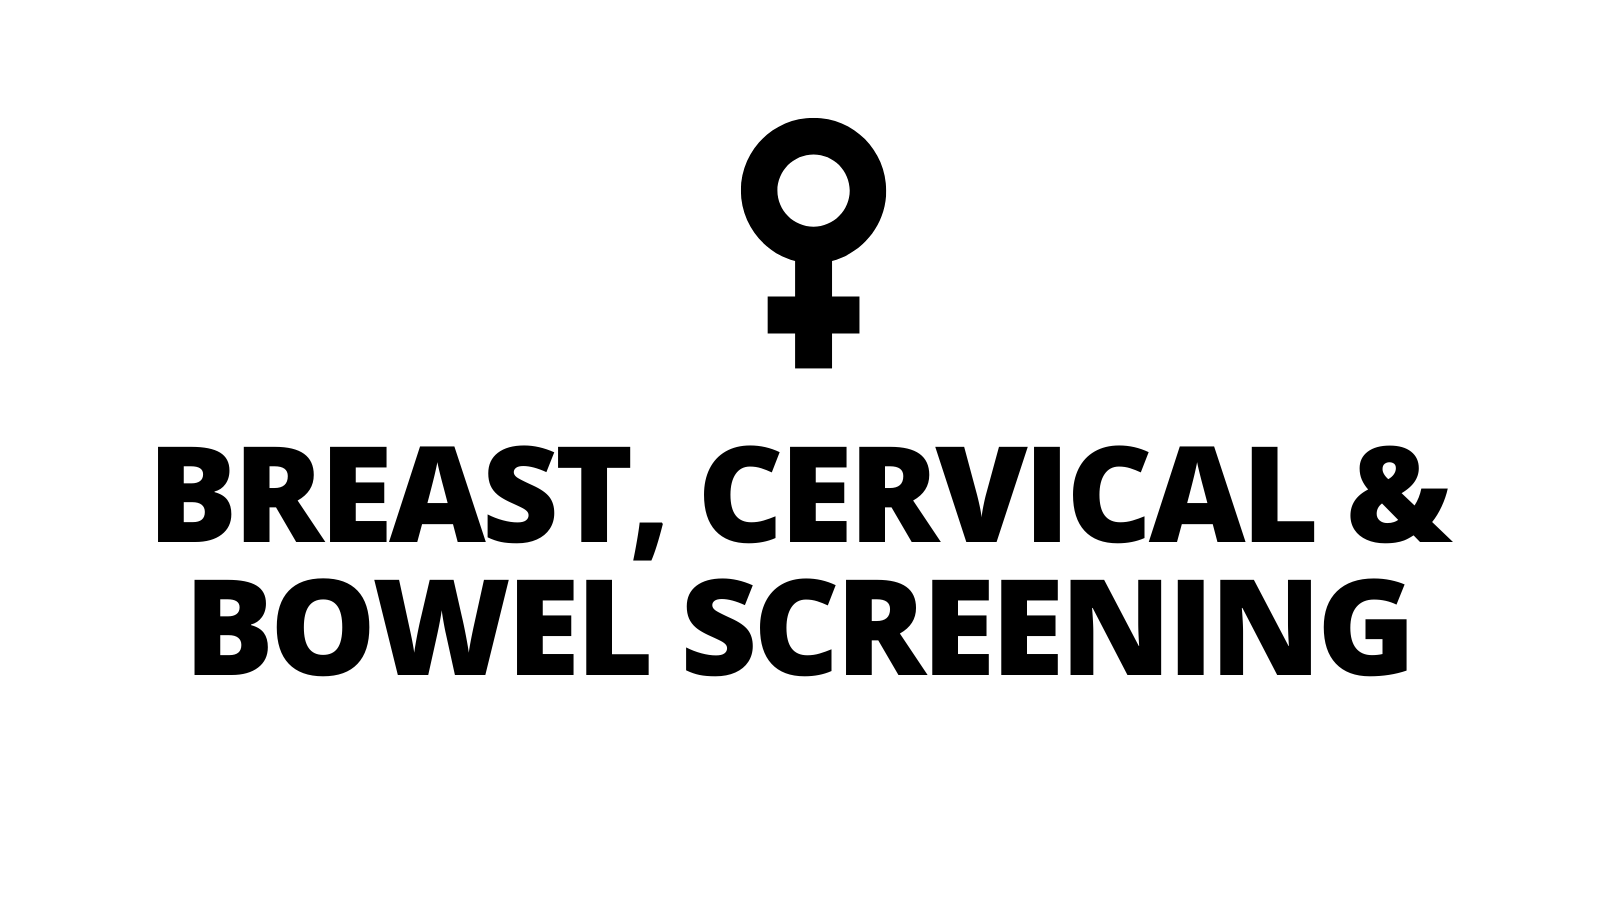 Breast, Cervical & Bowel Screening Awareness Events